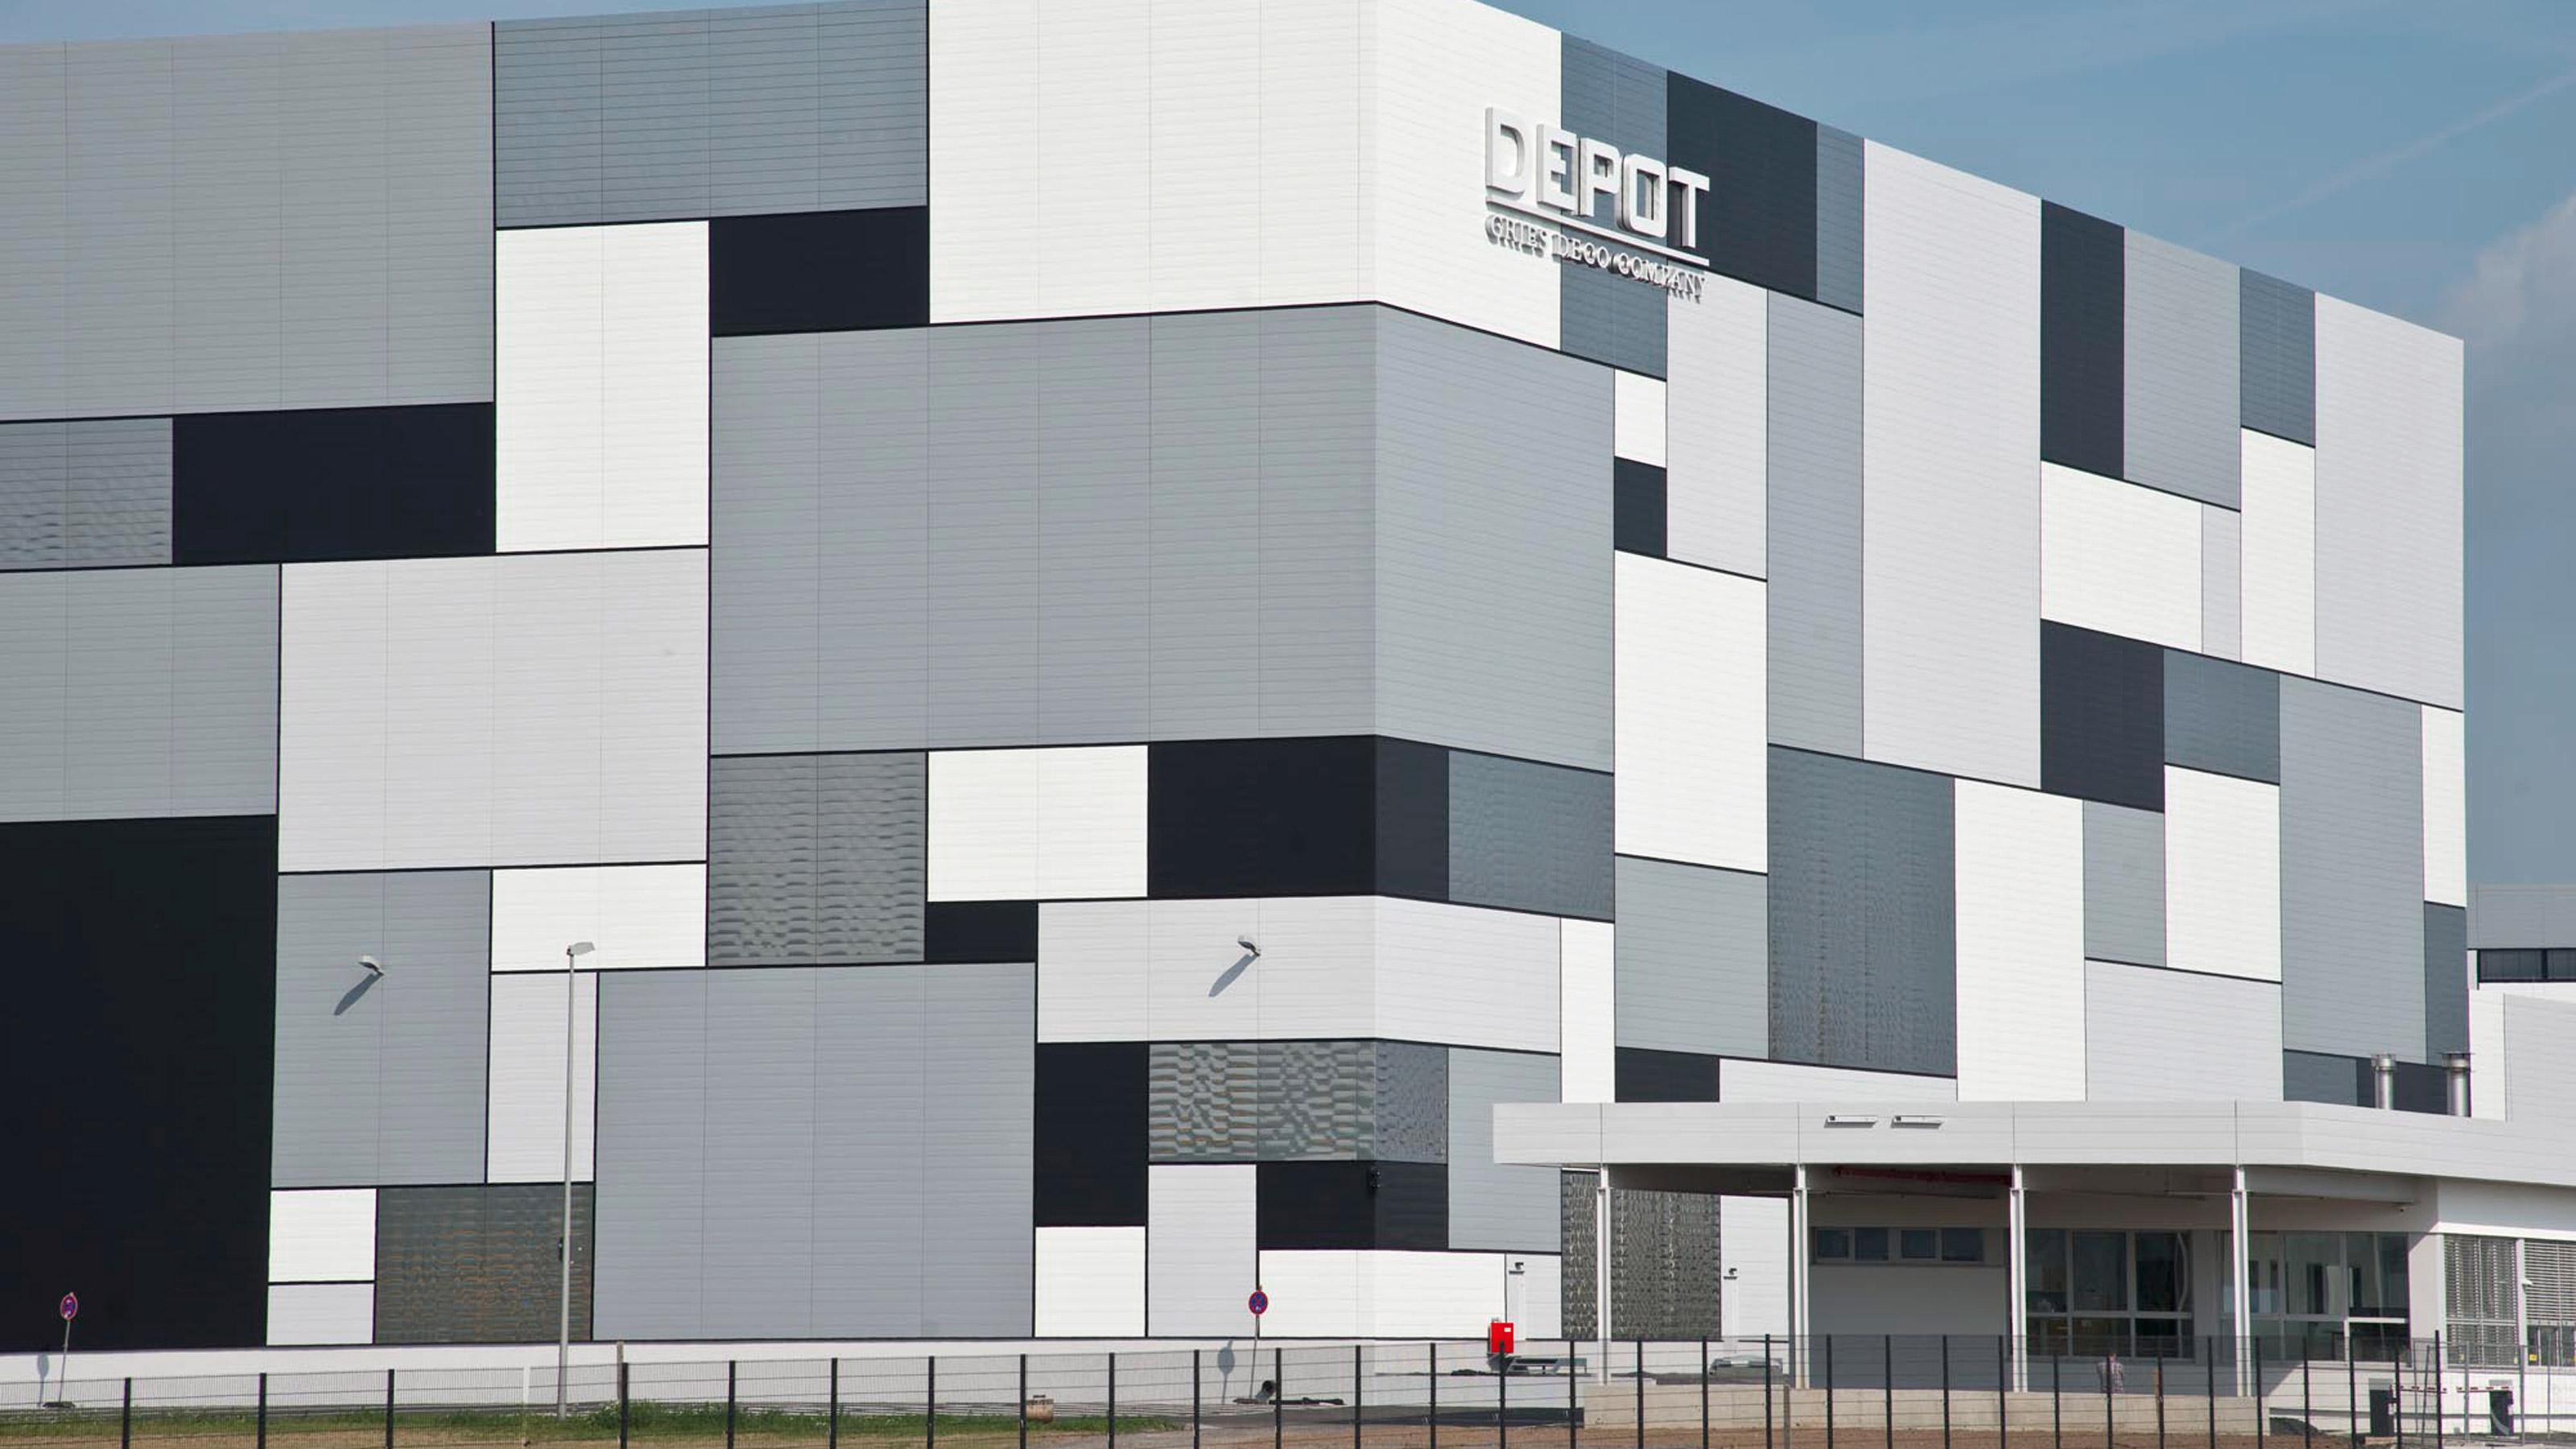 Gries Deco Dc Tranforms Depot Intralogisitcs Swisslog